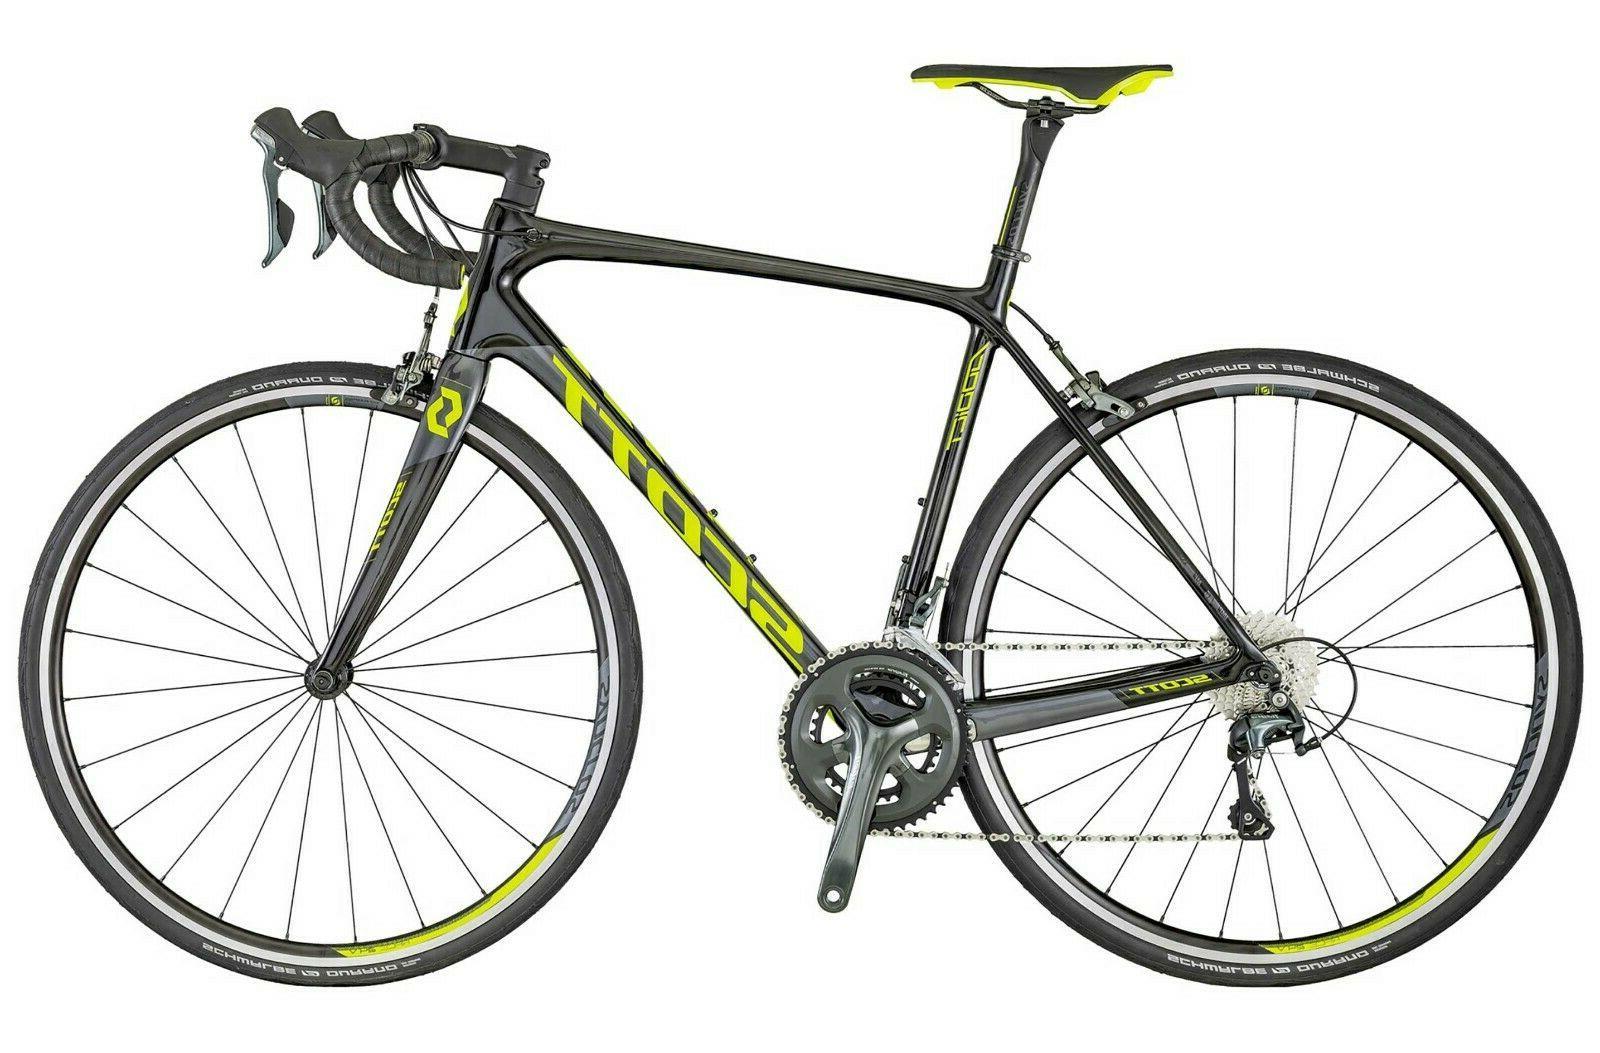 2018 addict 30 carbon fiber road bike